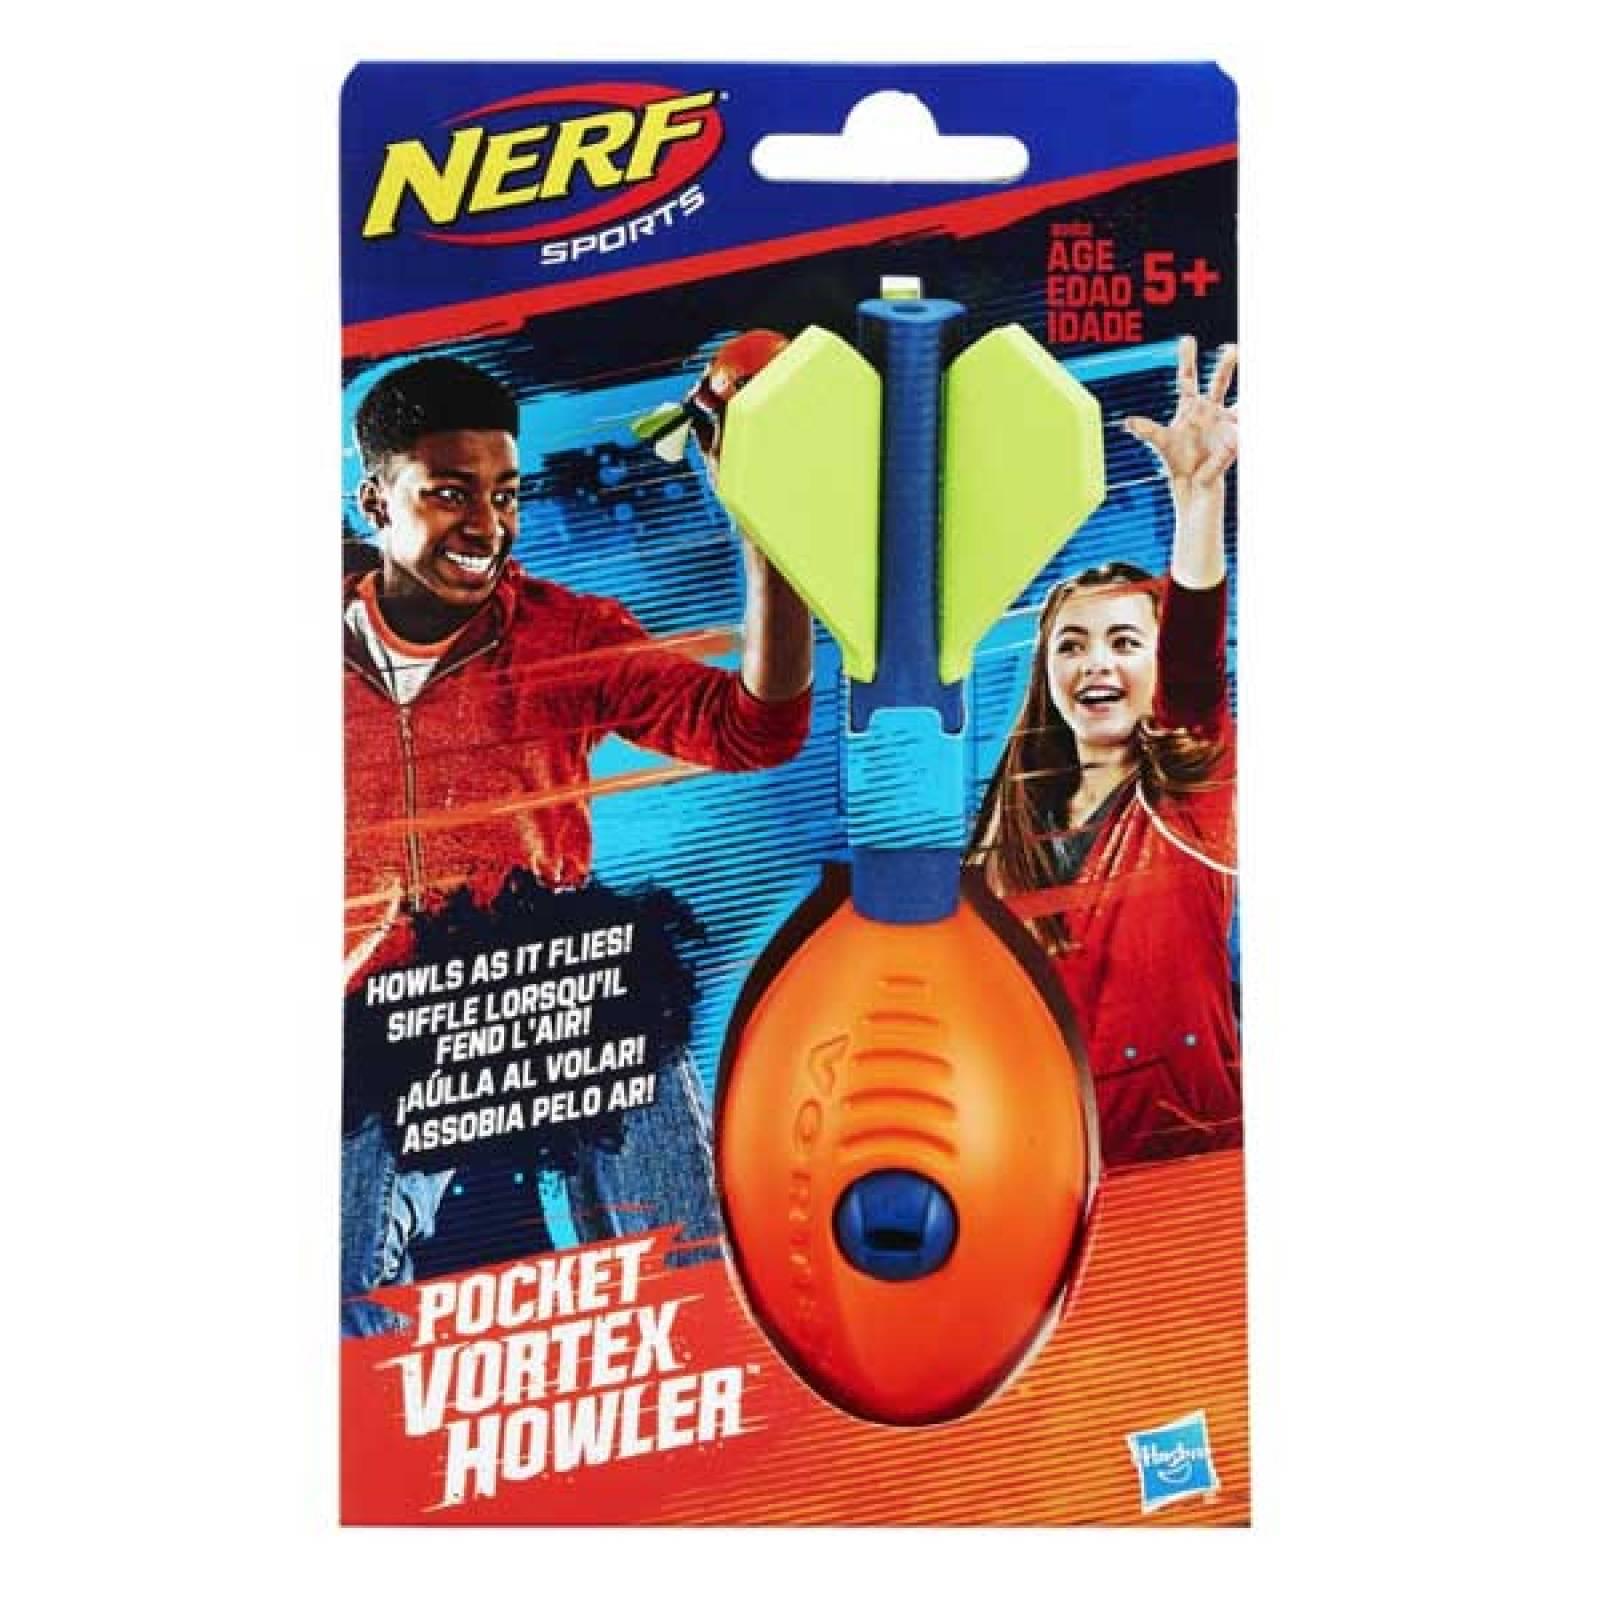 Nerf N-Sports Pocket Vortex Howler